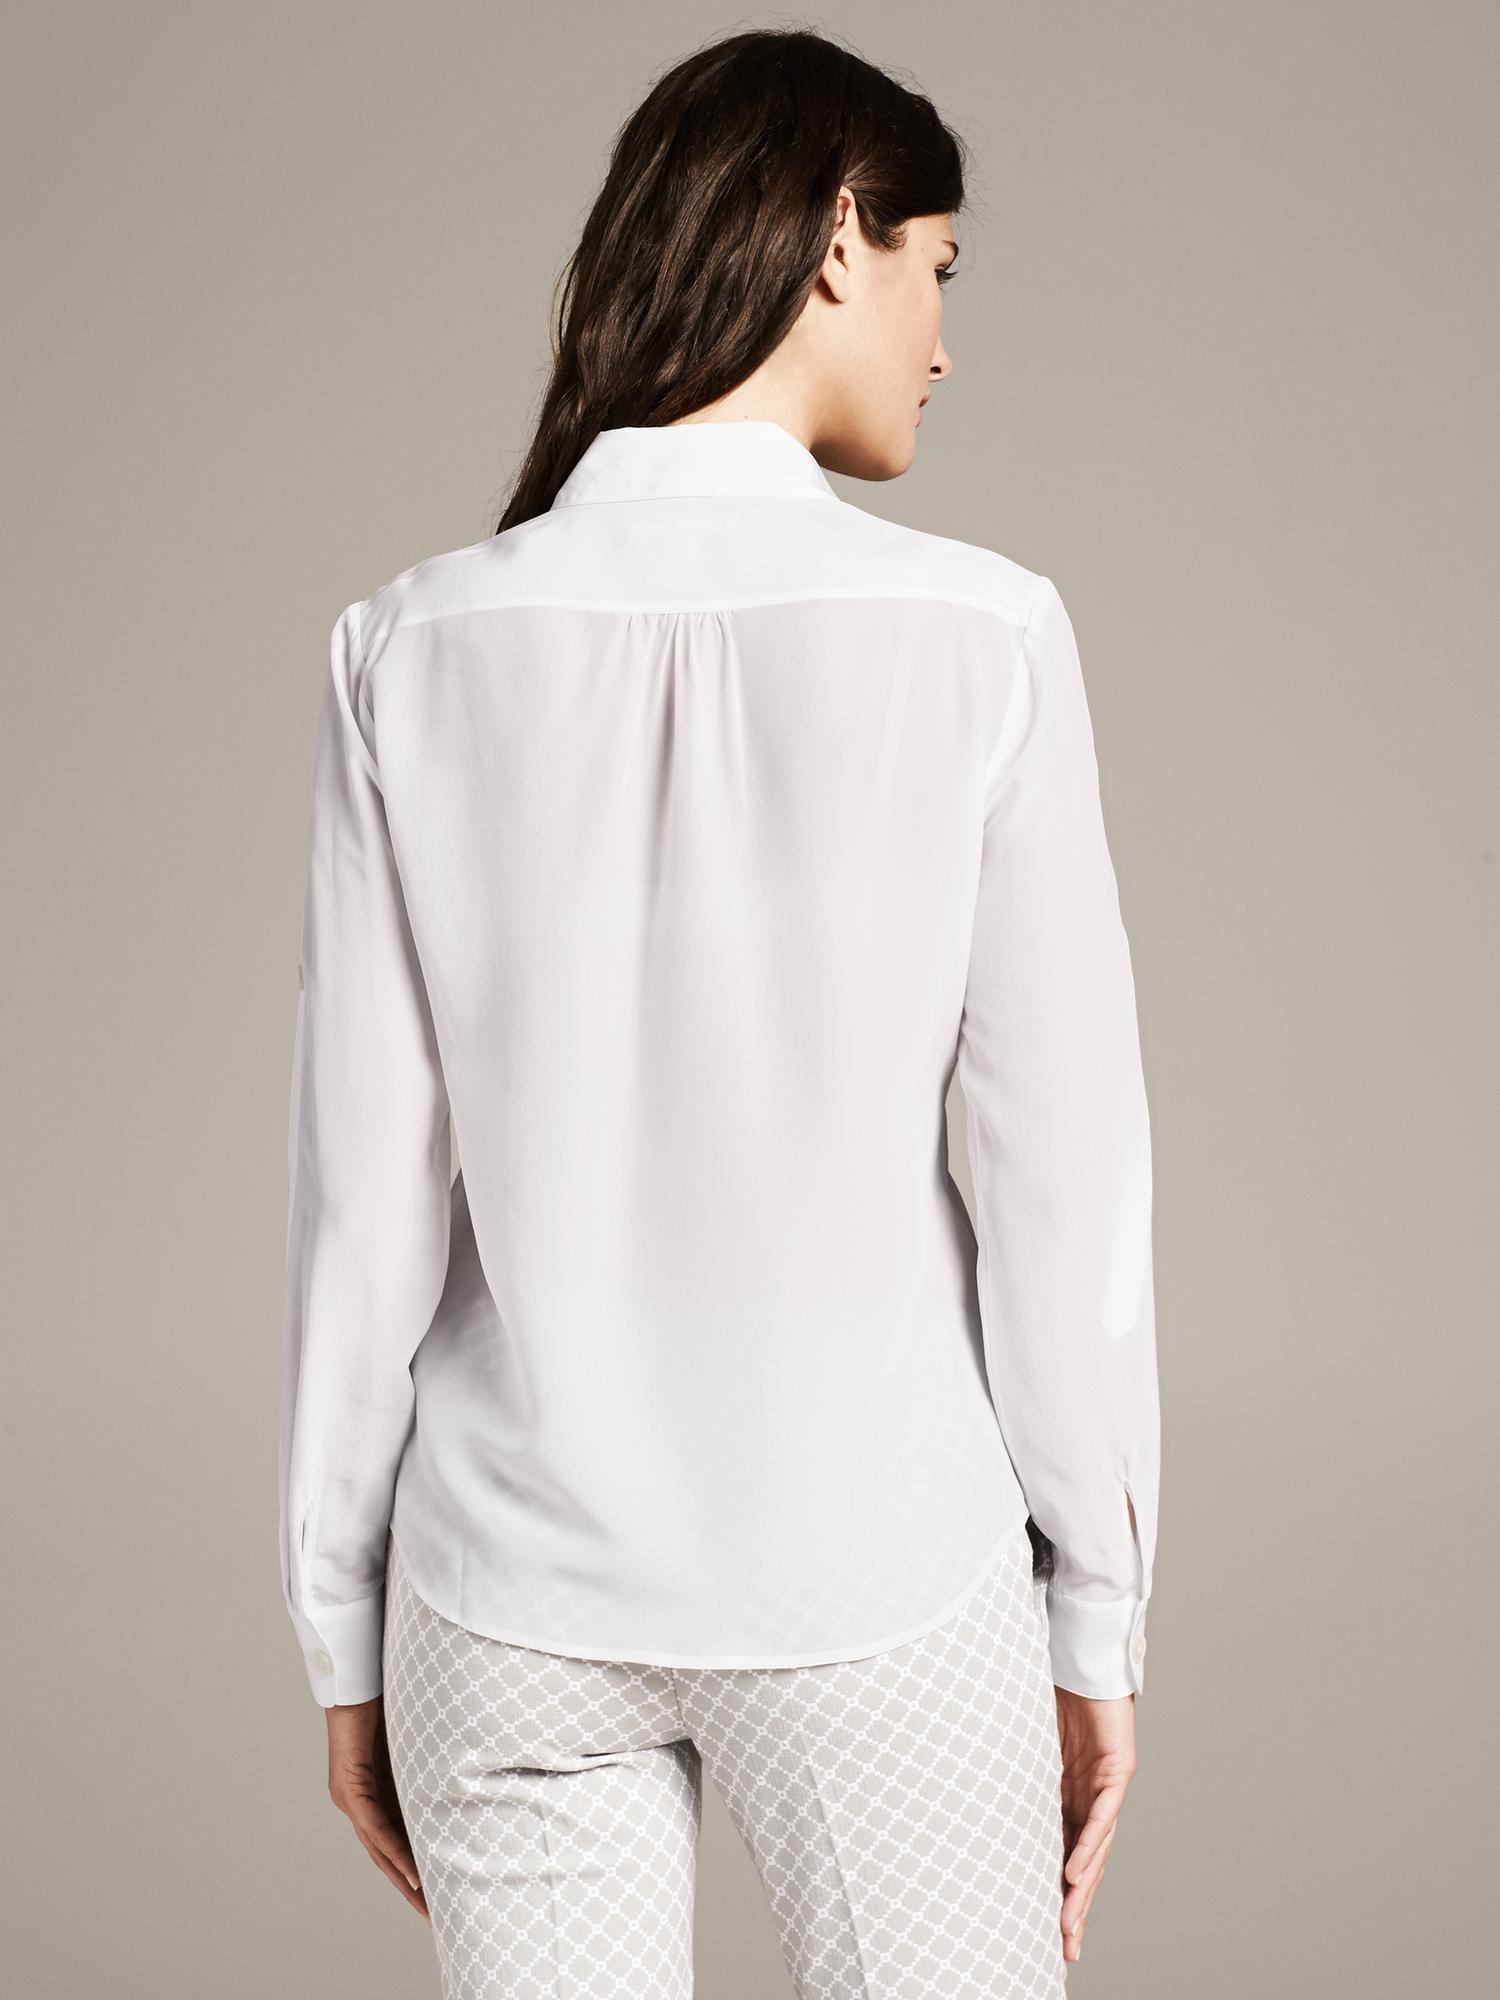 4522cc9555531 Lyst - Banana Republic White Silk Utility Blouse in White